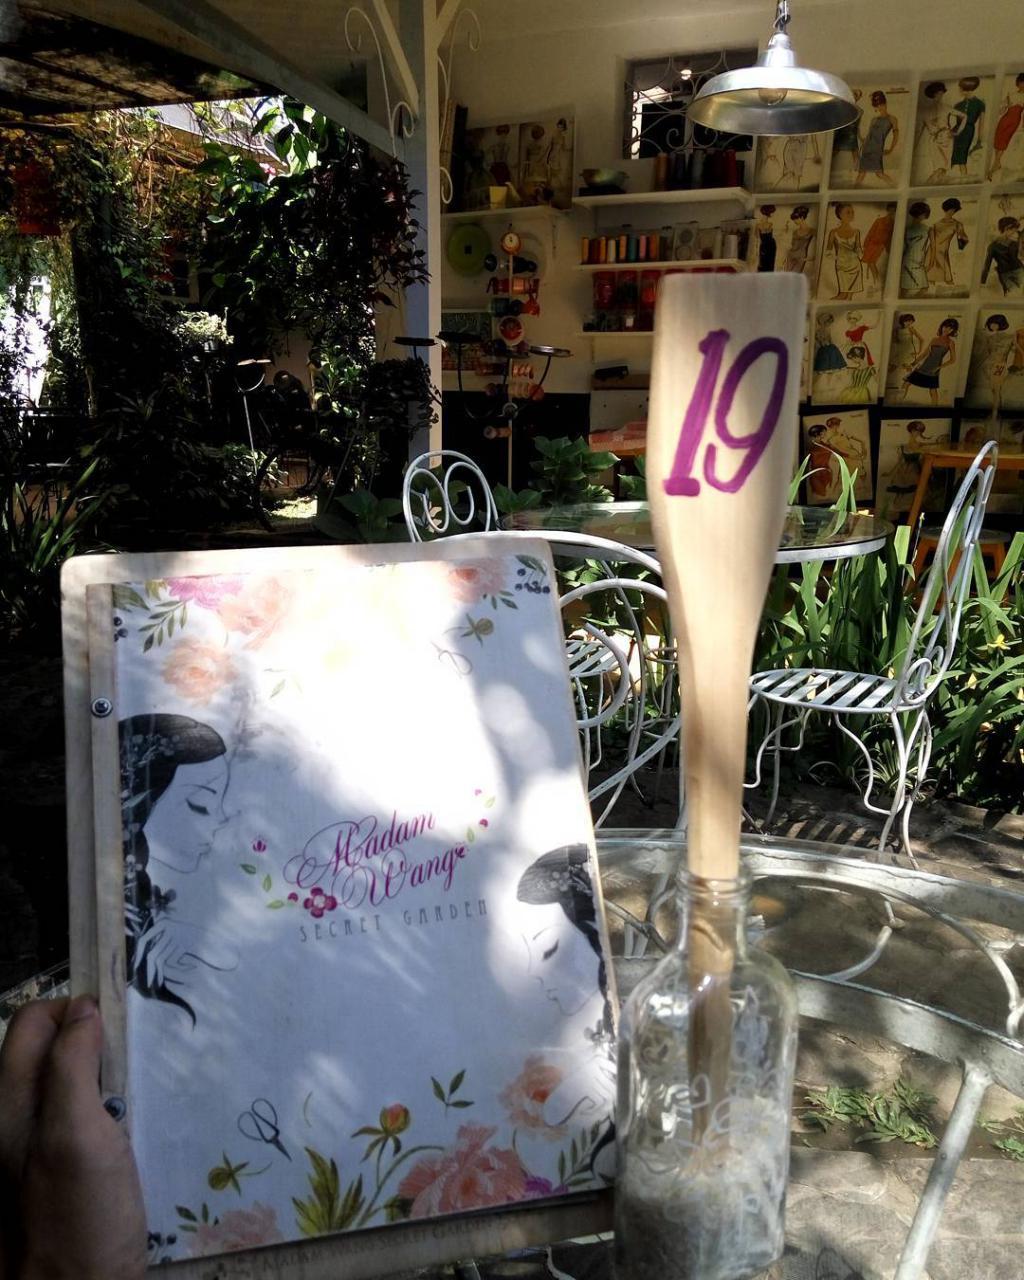 Madam Wang Secret Garden adalah salah satu kafe yang bertema kebun di Malang via @huang_xlong